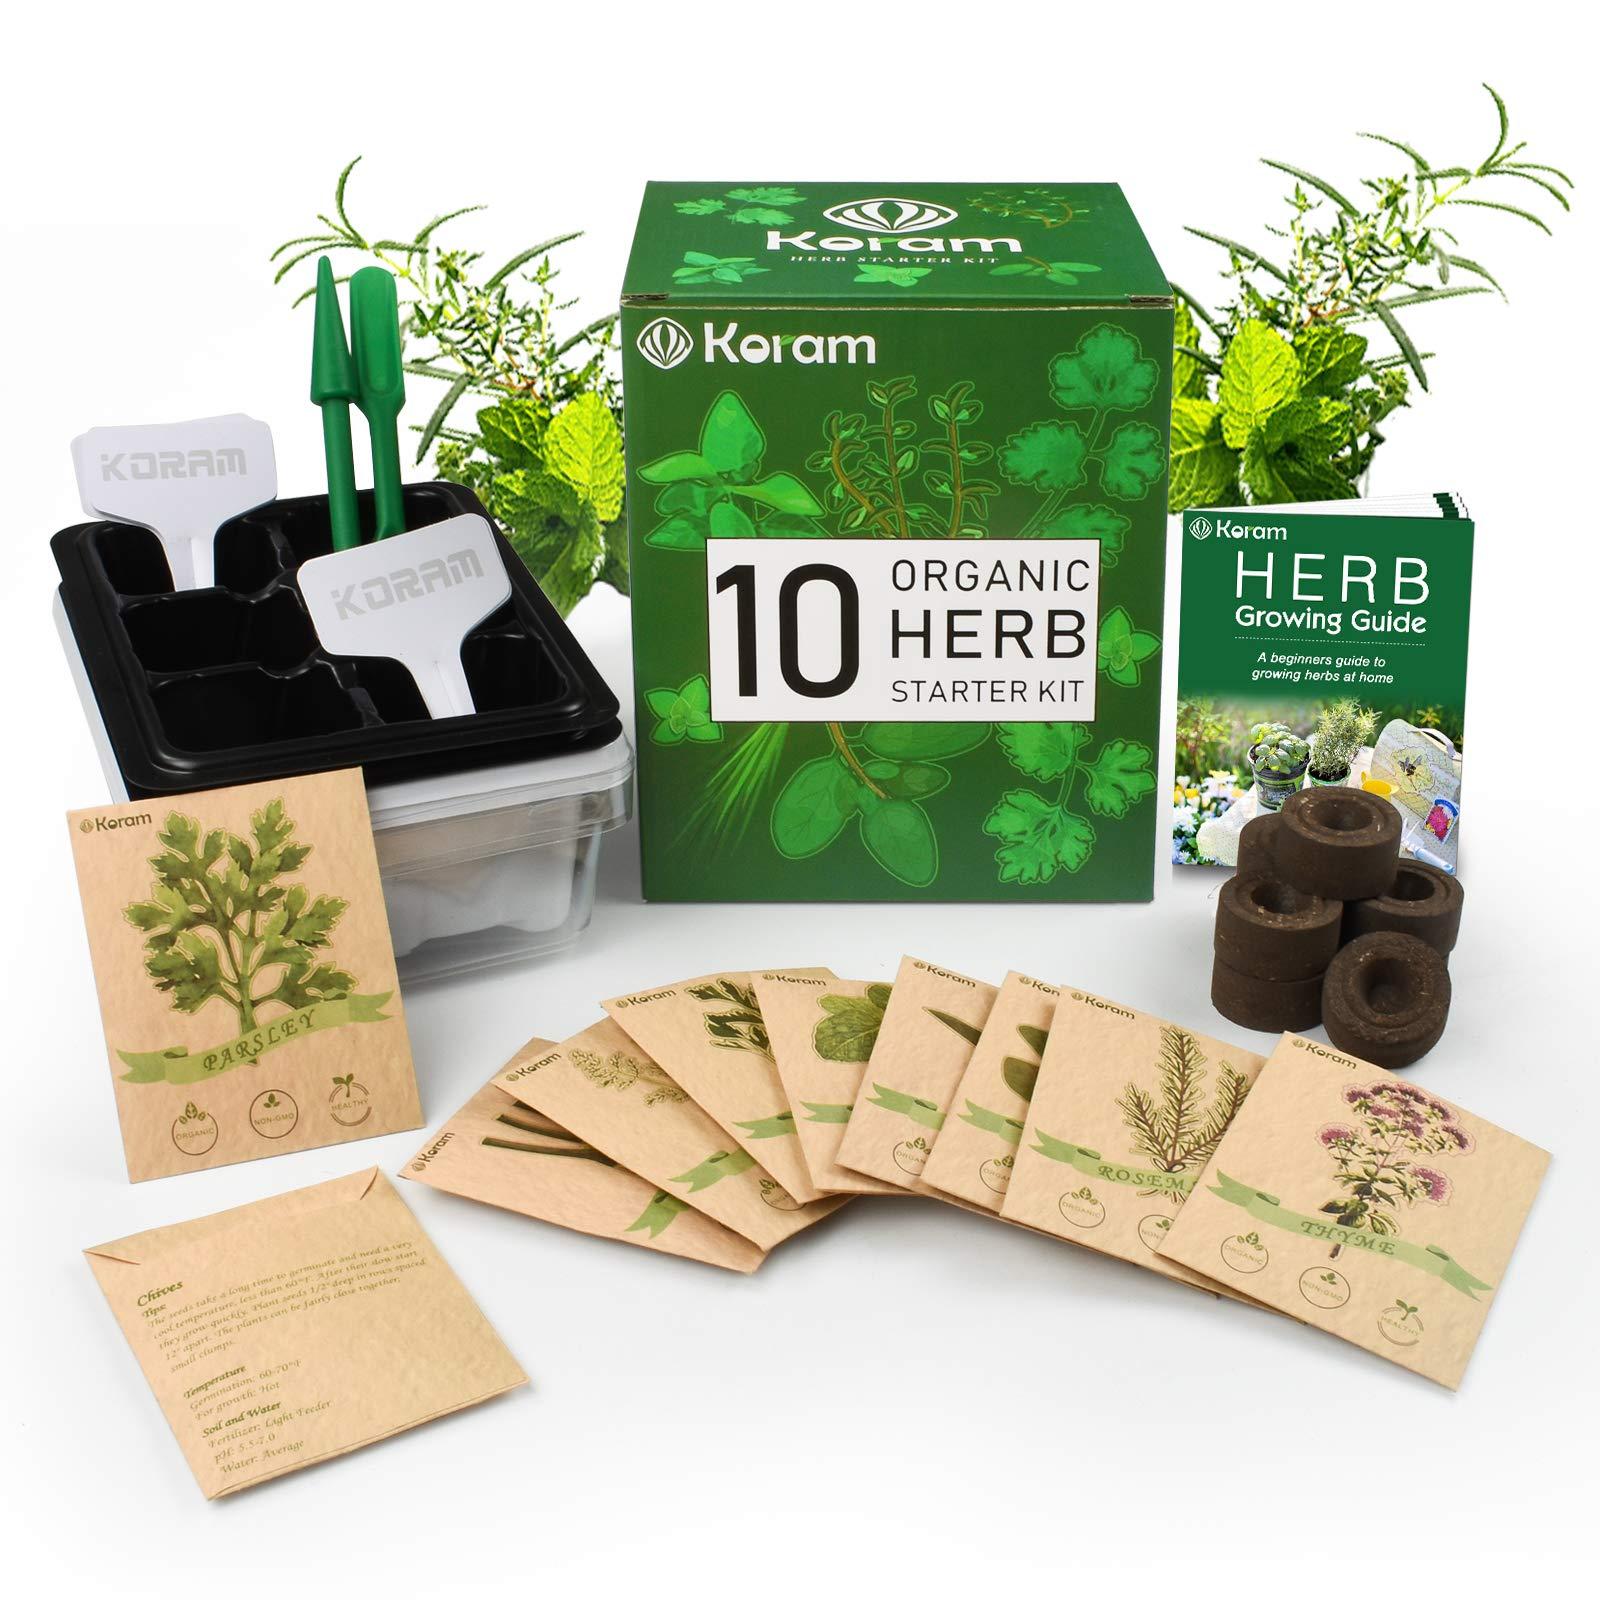 KORAM Herb Garden Kit Growing Kit Gardening Starter Set- 10 Herbs Grow from Organic Seeds Indoor Herb Kit with Everything a Gardener Needs for Growing Herbs Indoors, Kitchen, Balcony, Window Sill by KORAM